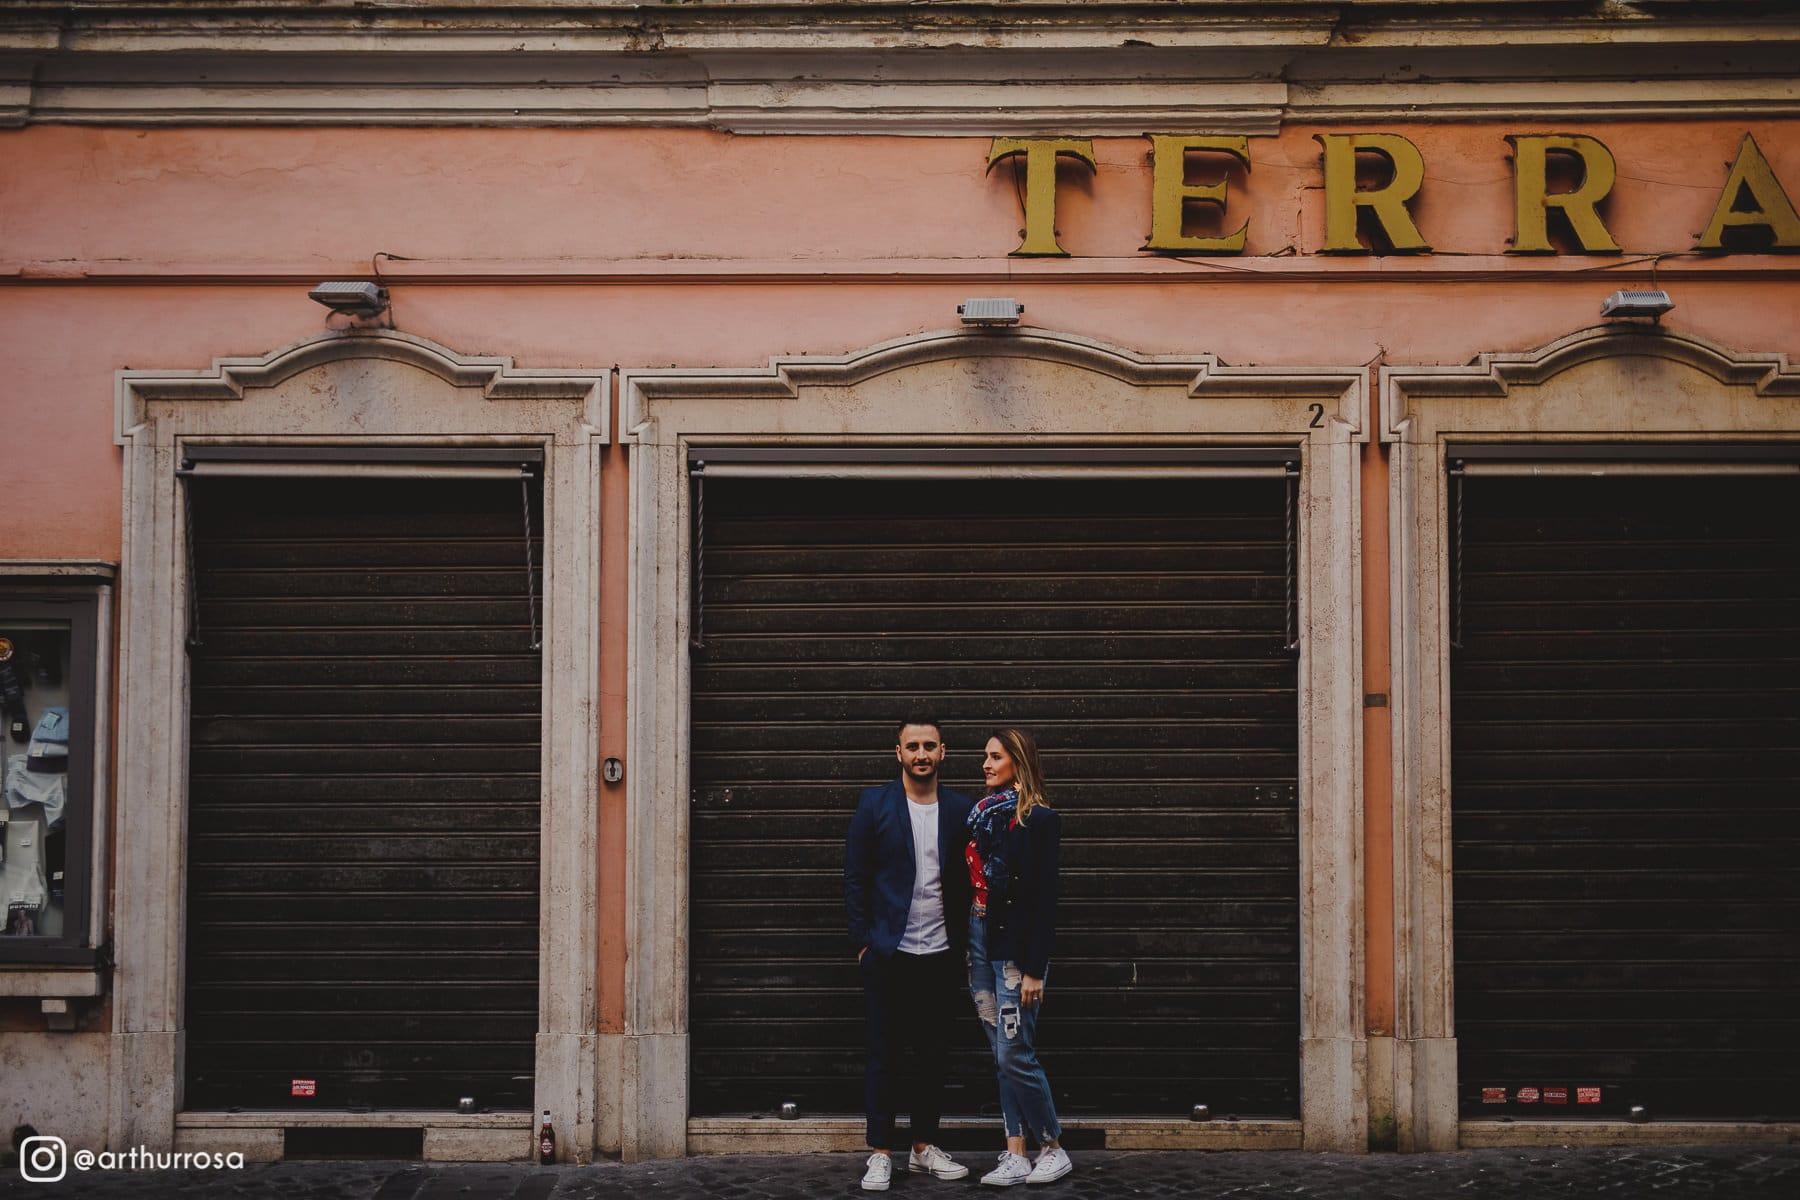 fotógrafo brasileiro na italia